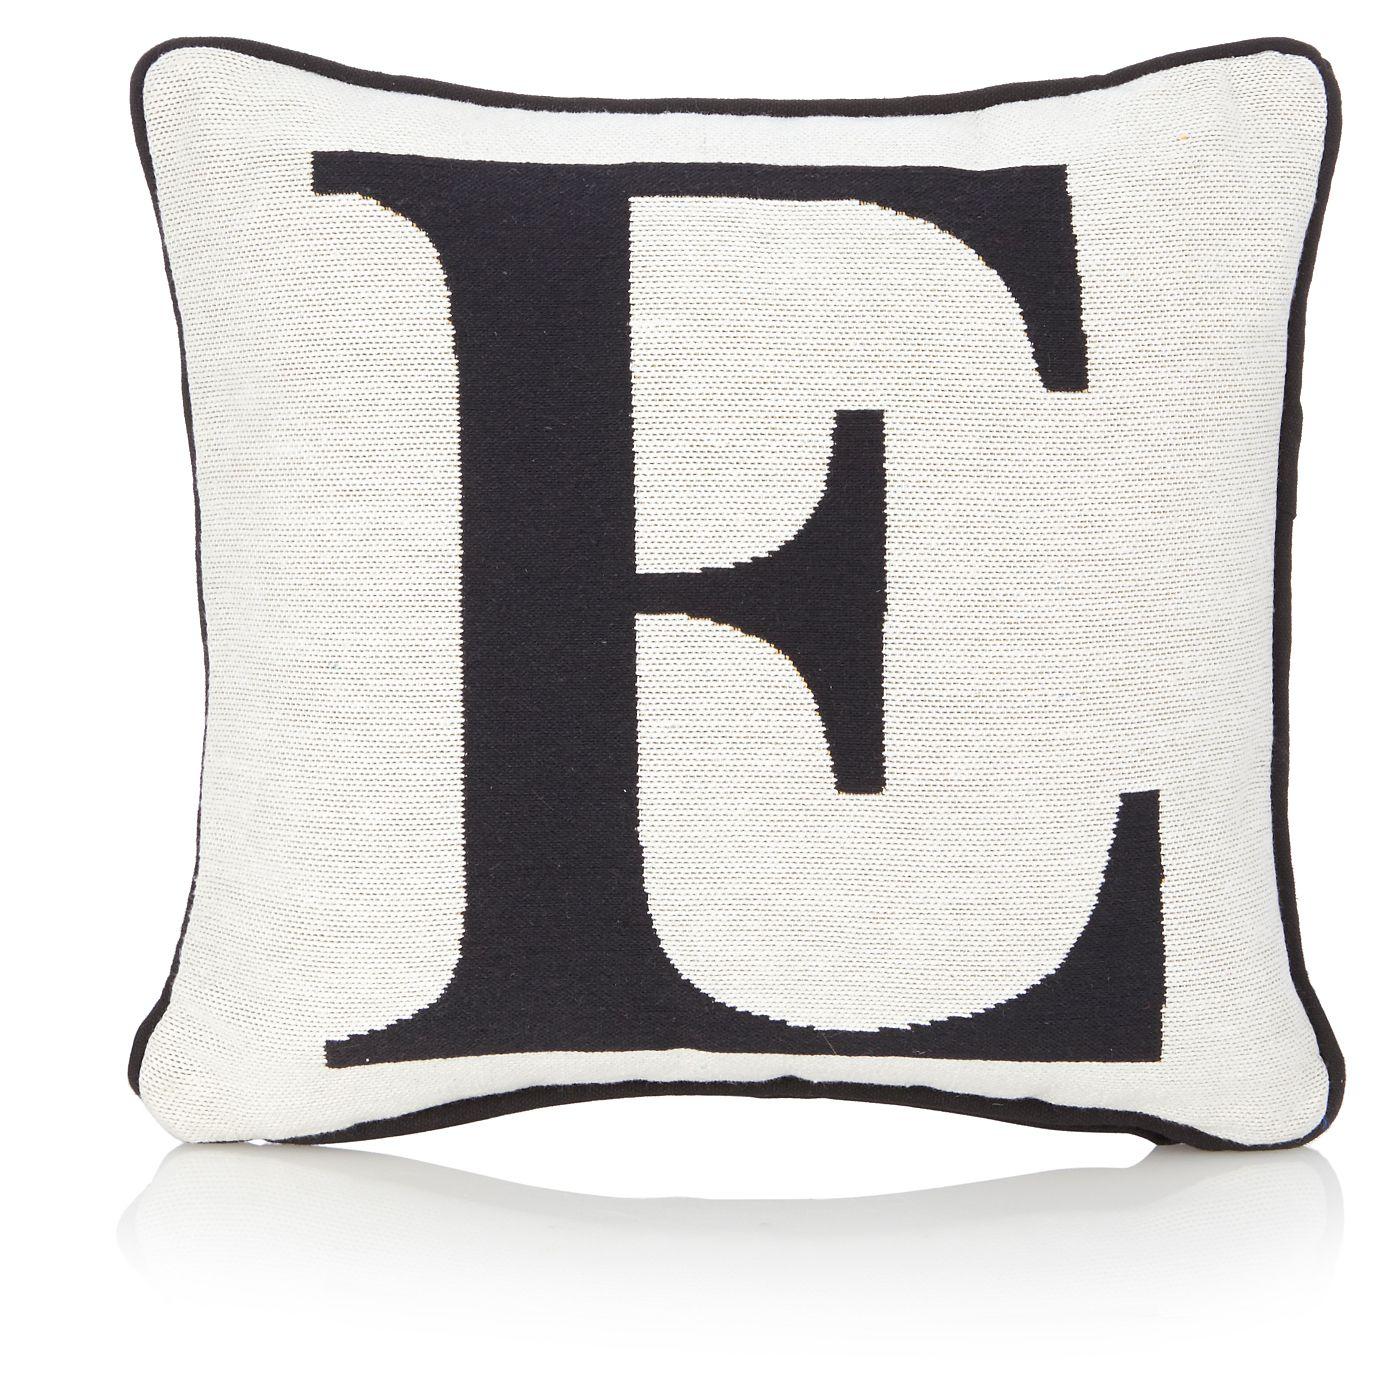 george home letter e cushion view all living room asda direct rh za pinterest com